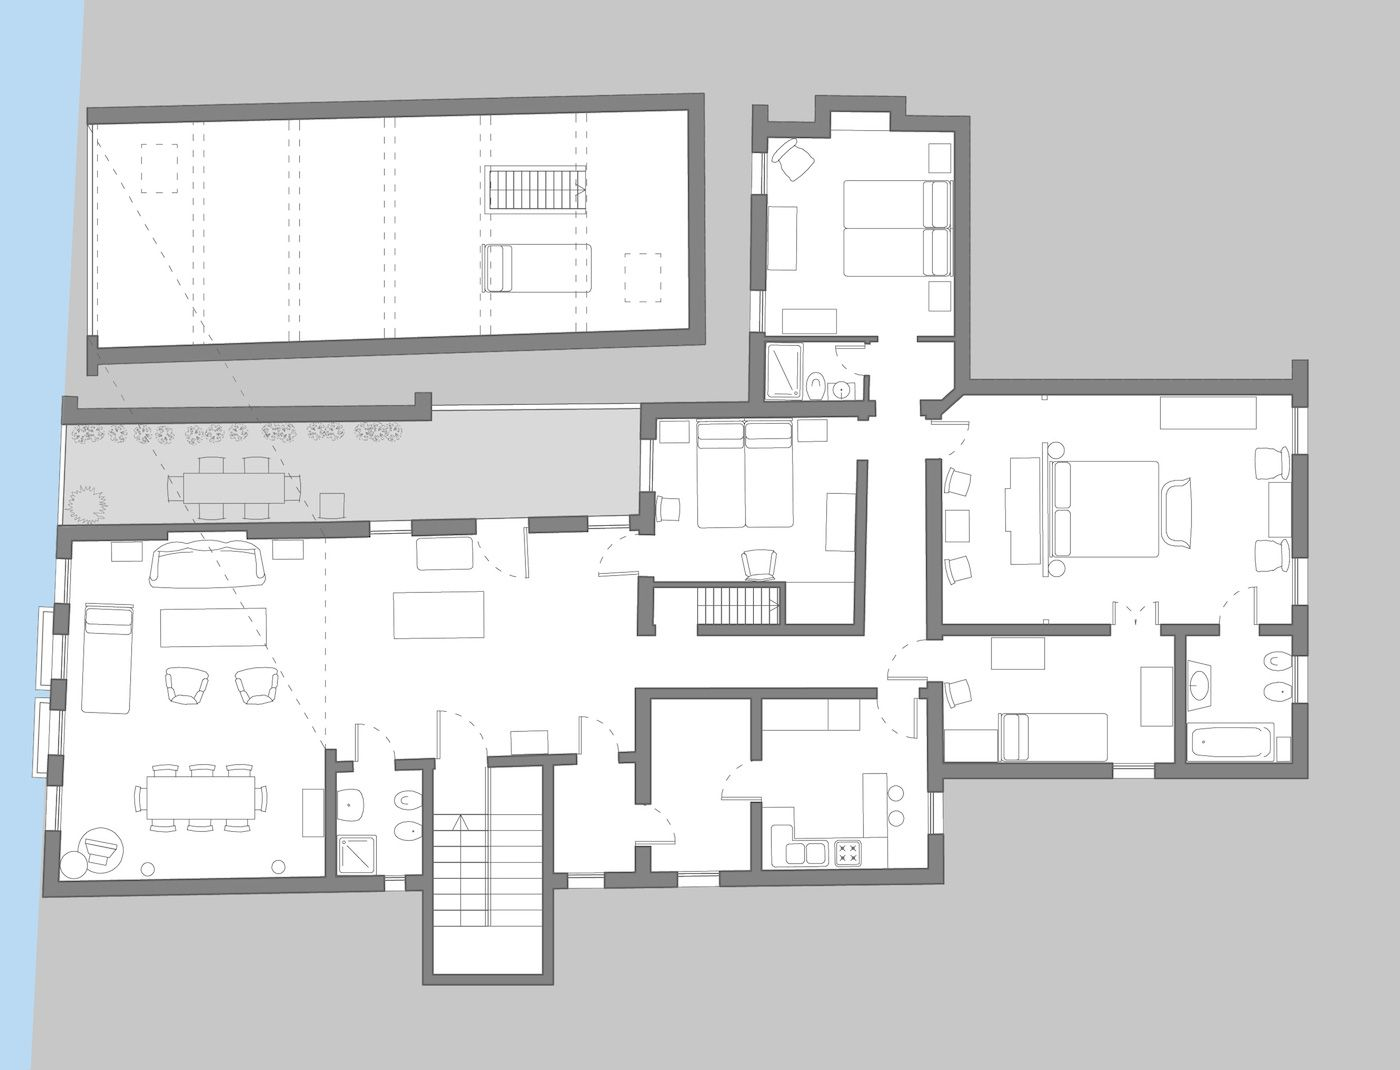 Mocenigo floor plan